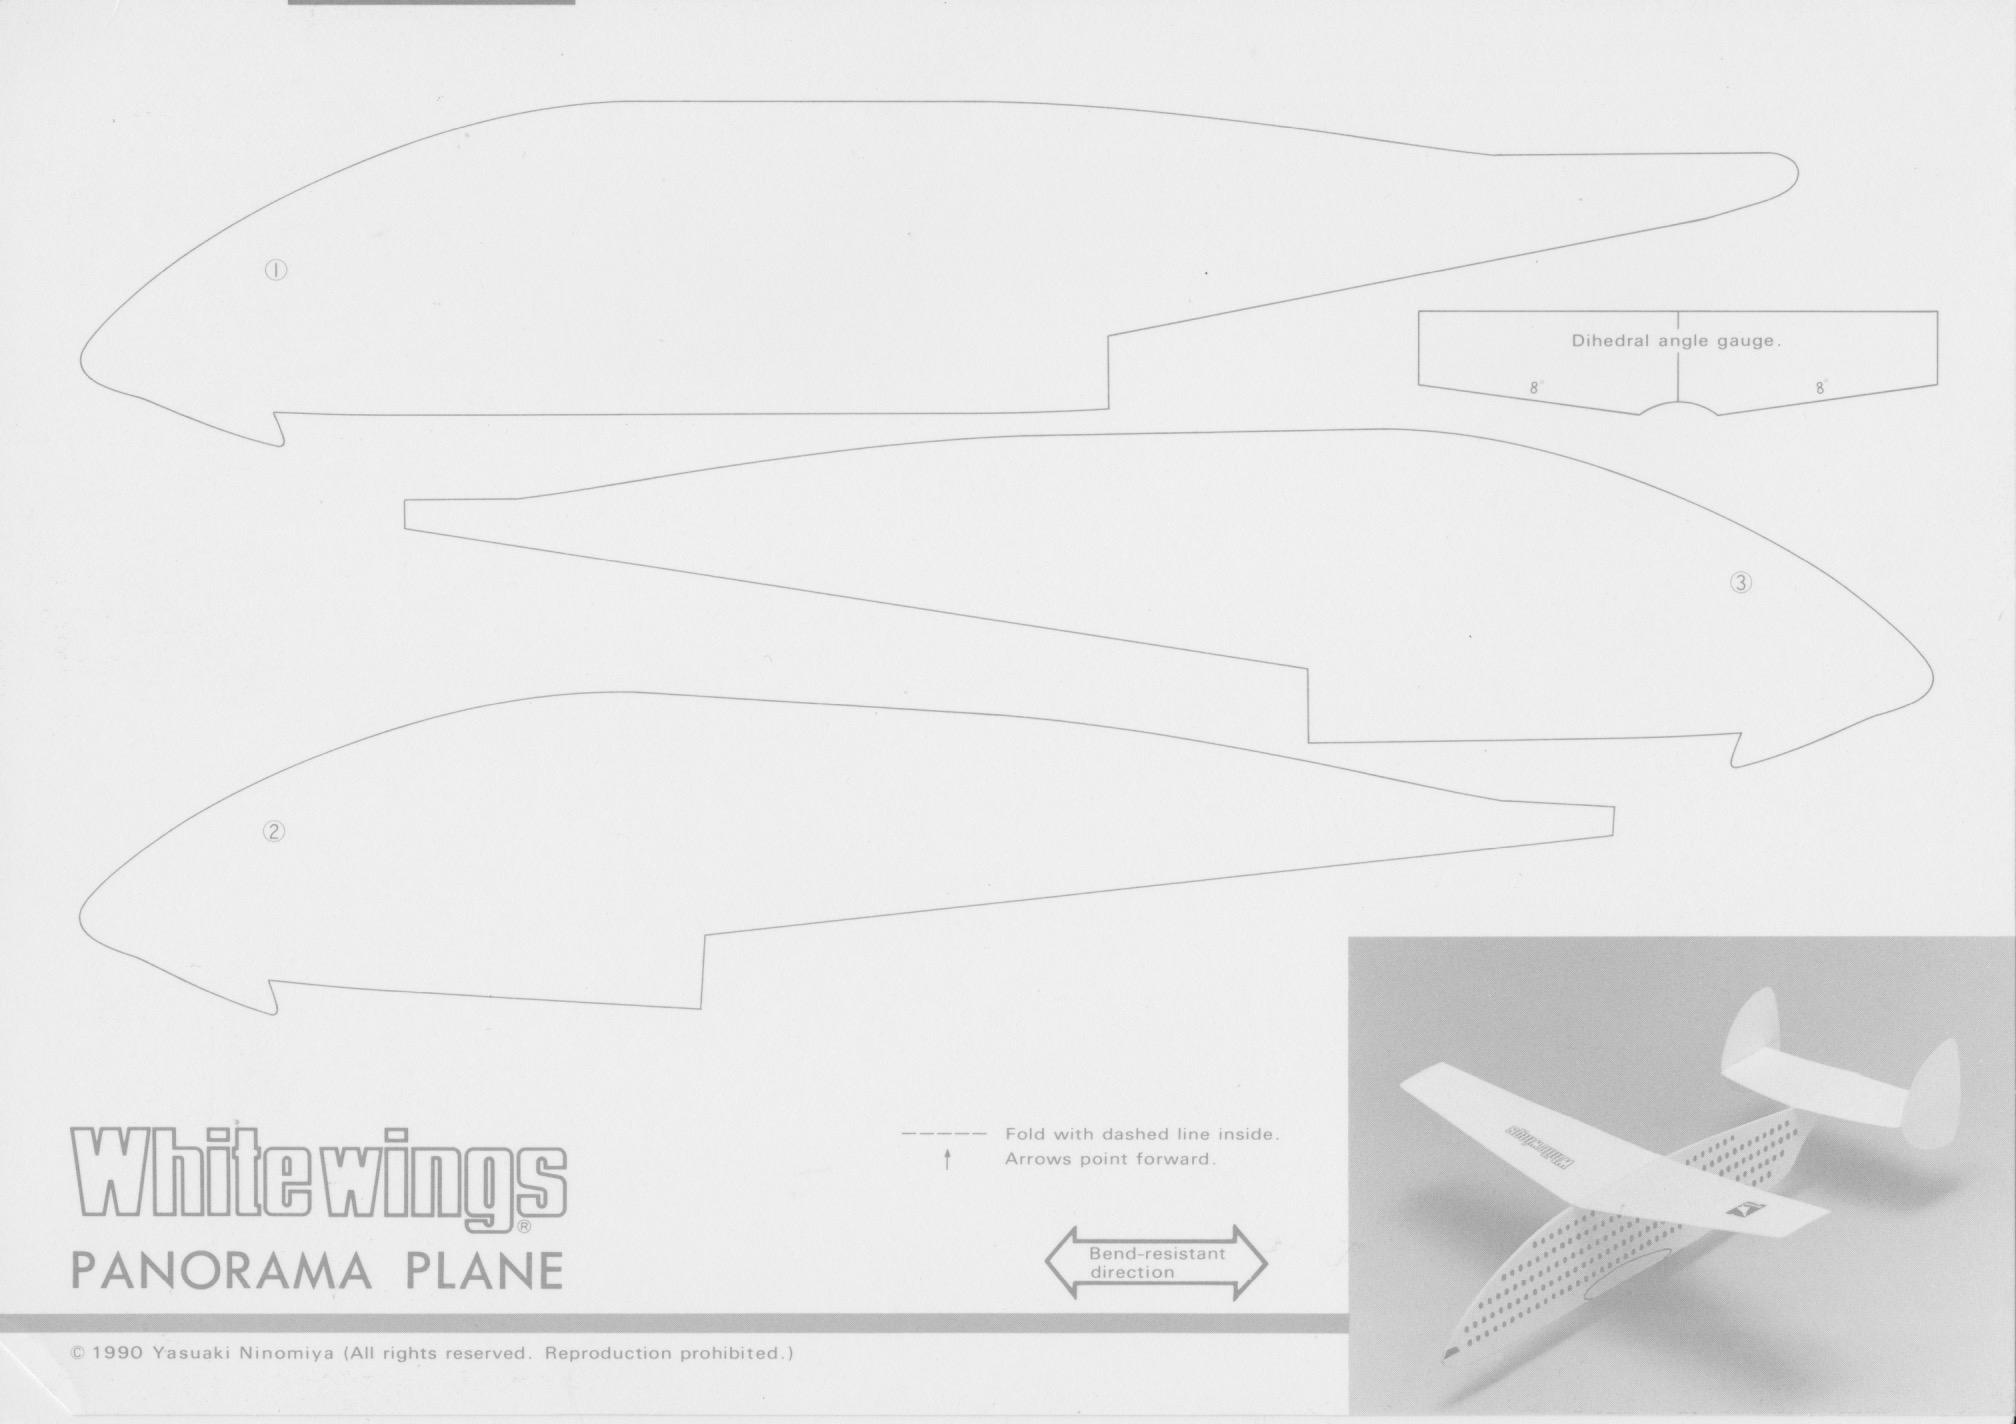 Panorama_plane_1.jpeg